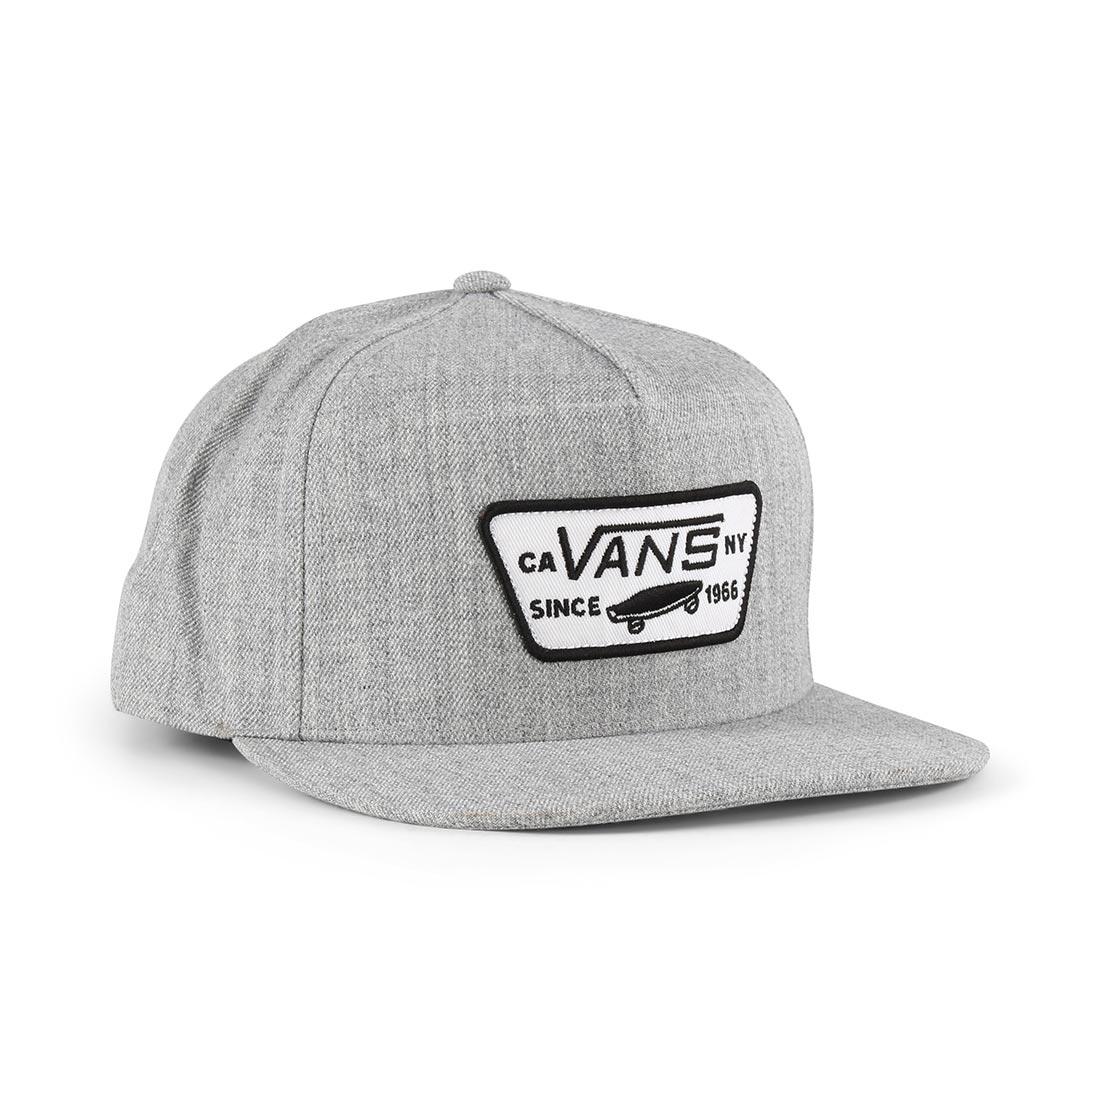 8b6b6c398851c6 Vans Full Patch Snapback Hat – Heather Grey